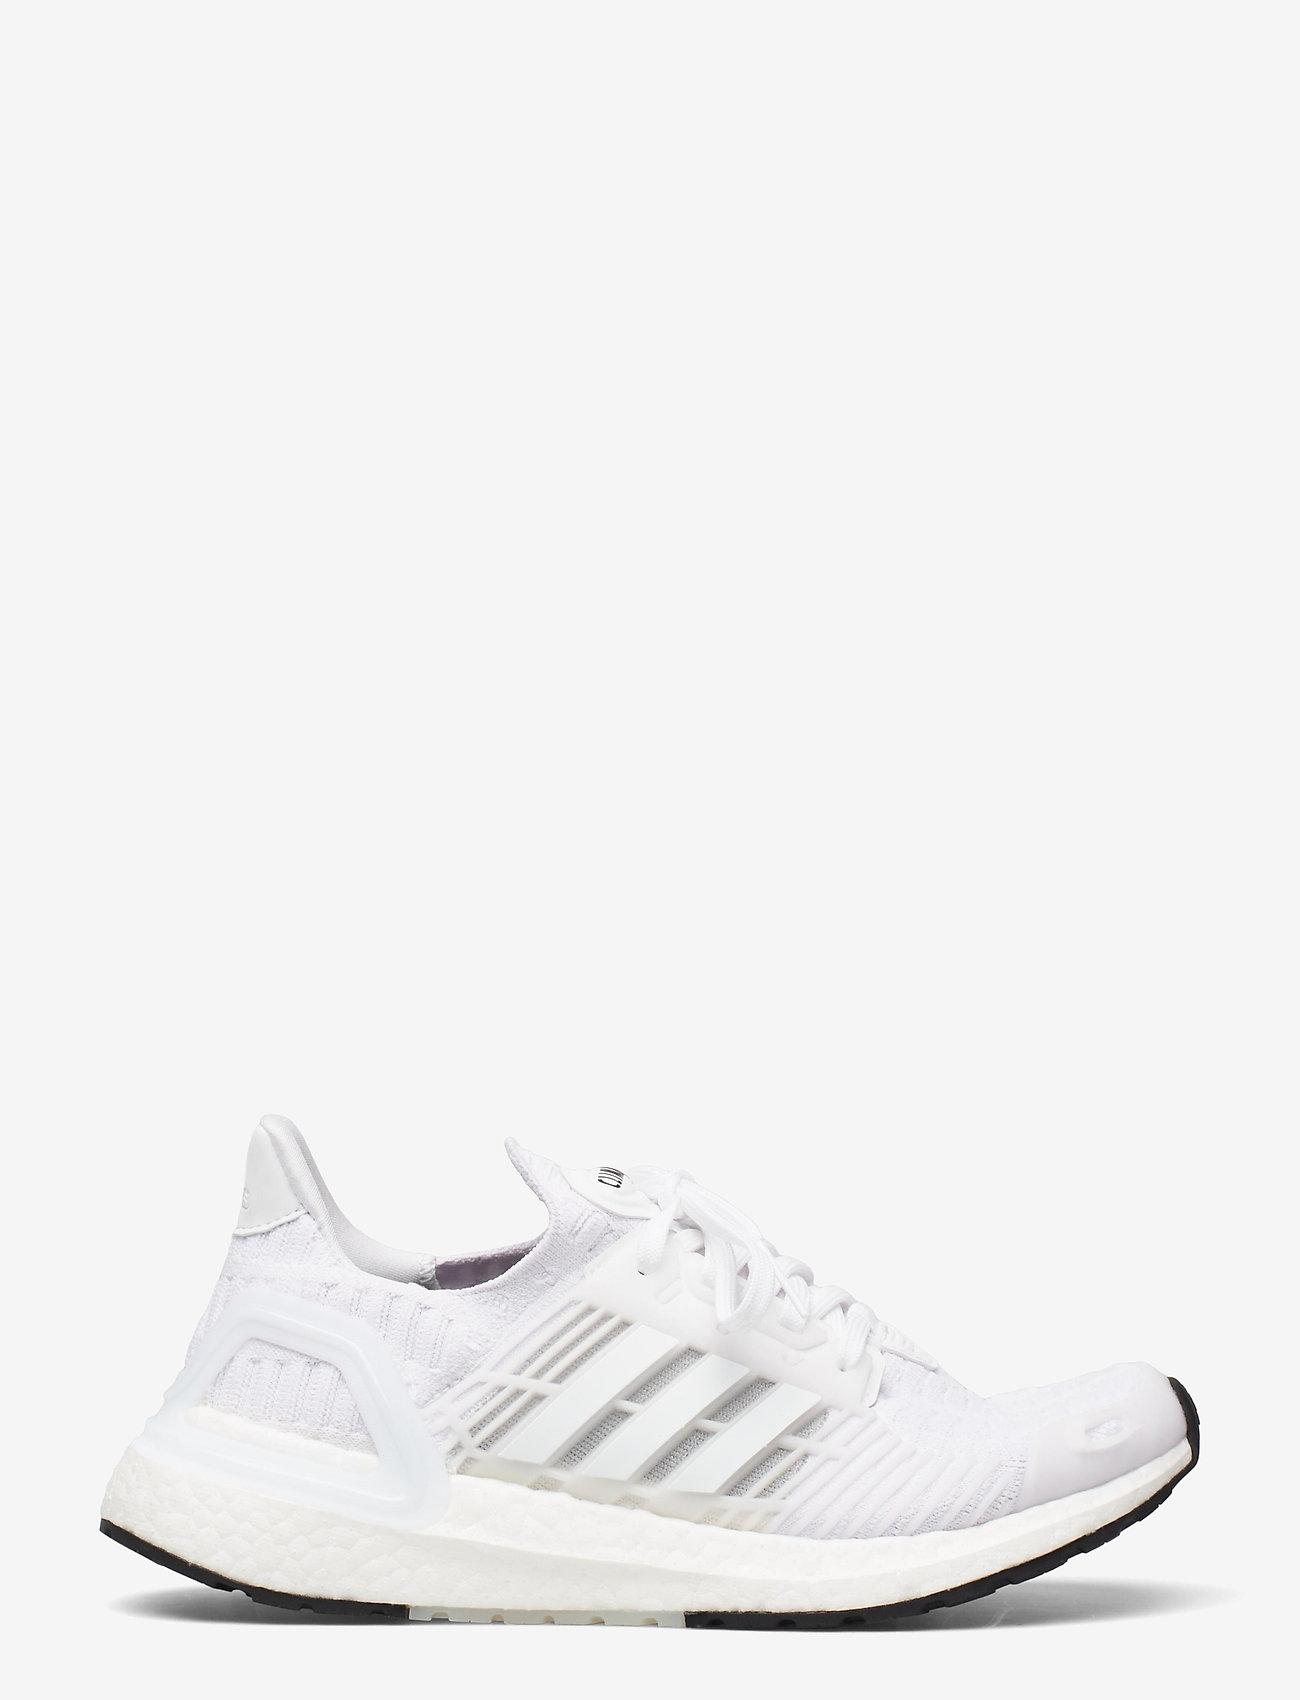 adidas Performance - ULTRABOOST CC_1 DNA - löbesko - ftwwht/ftwwht/cblack - 1